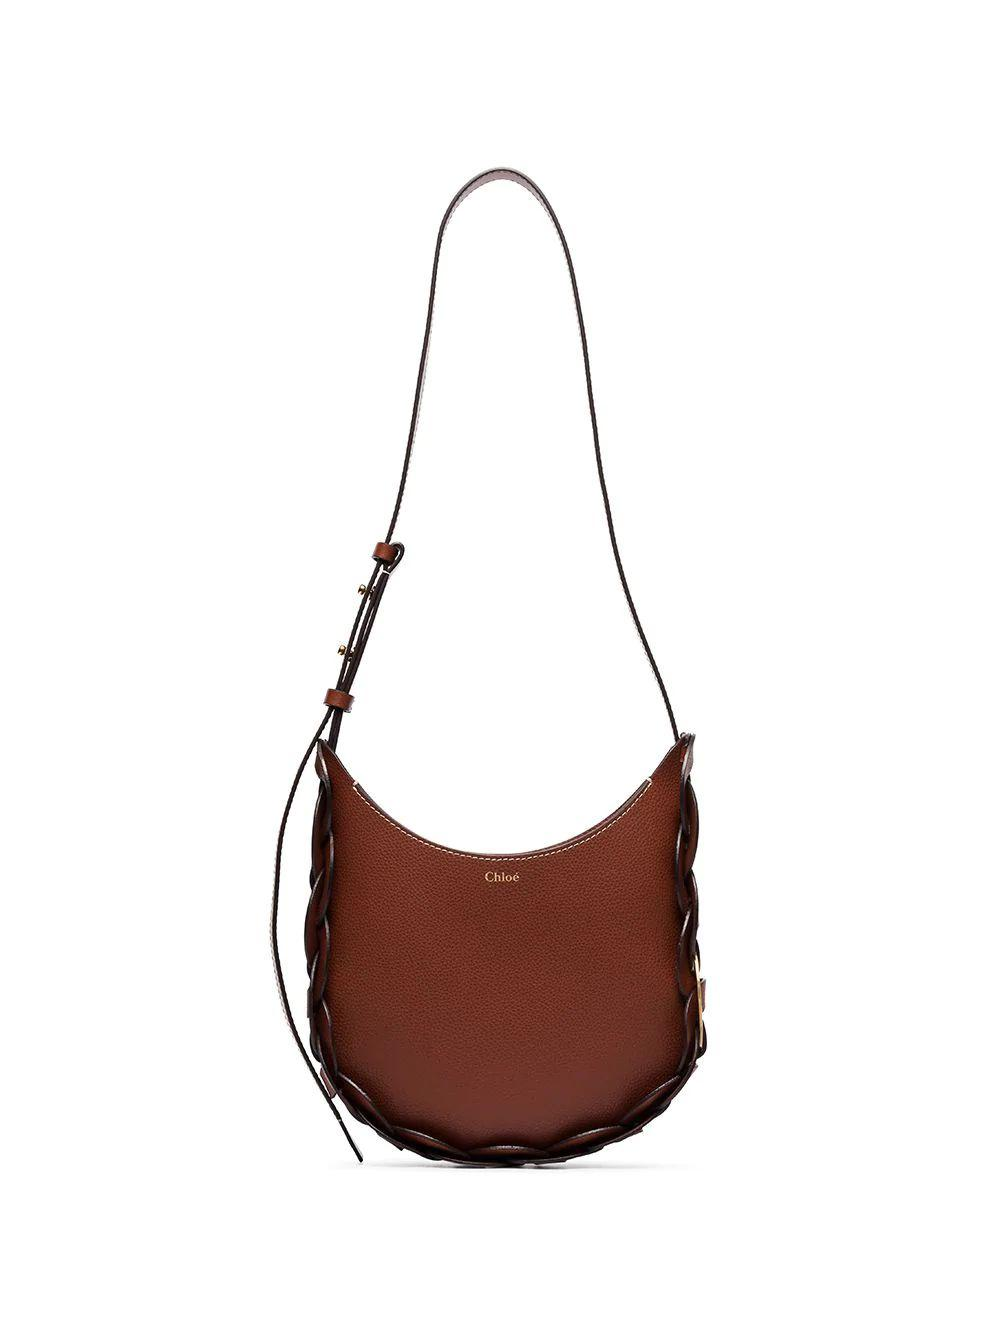 Small Darryl Hobo Bag Item # CHC20US342C6127S